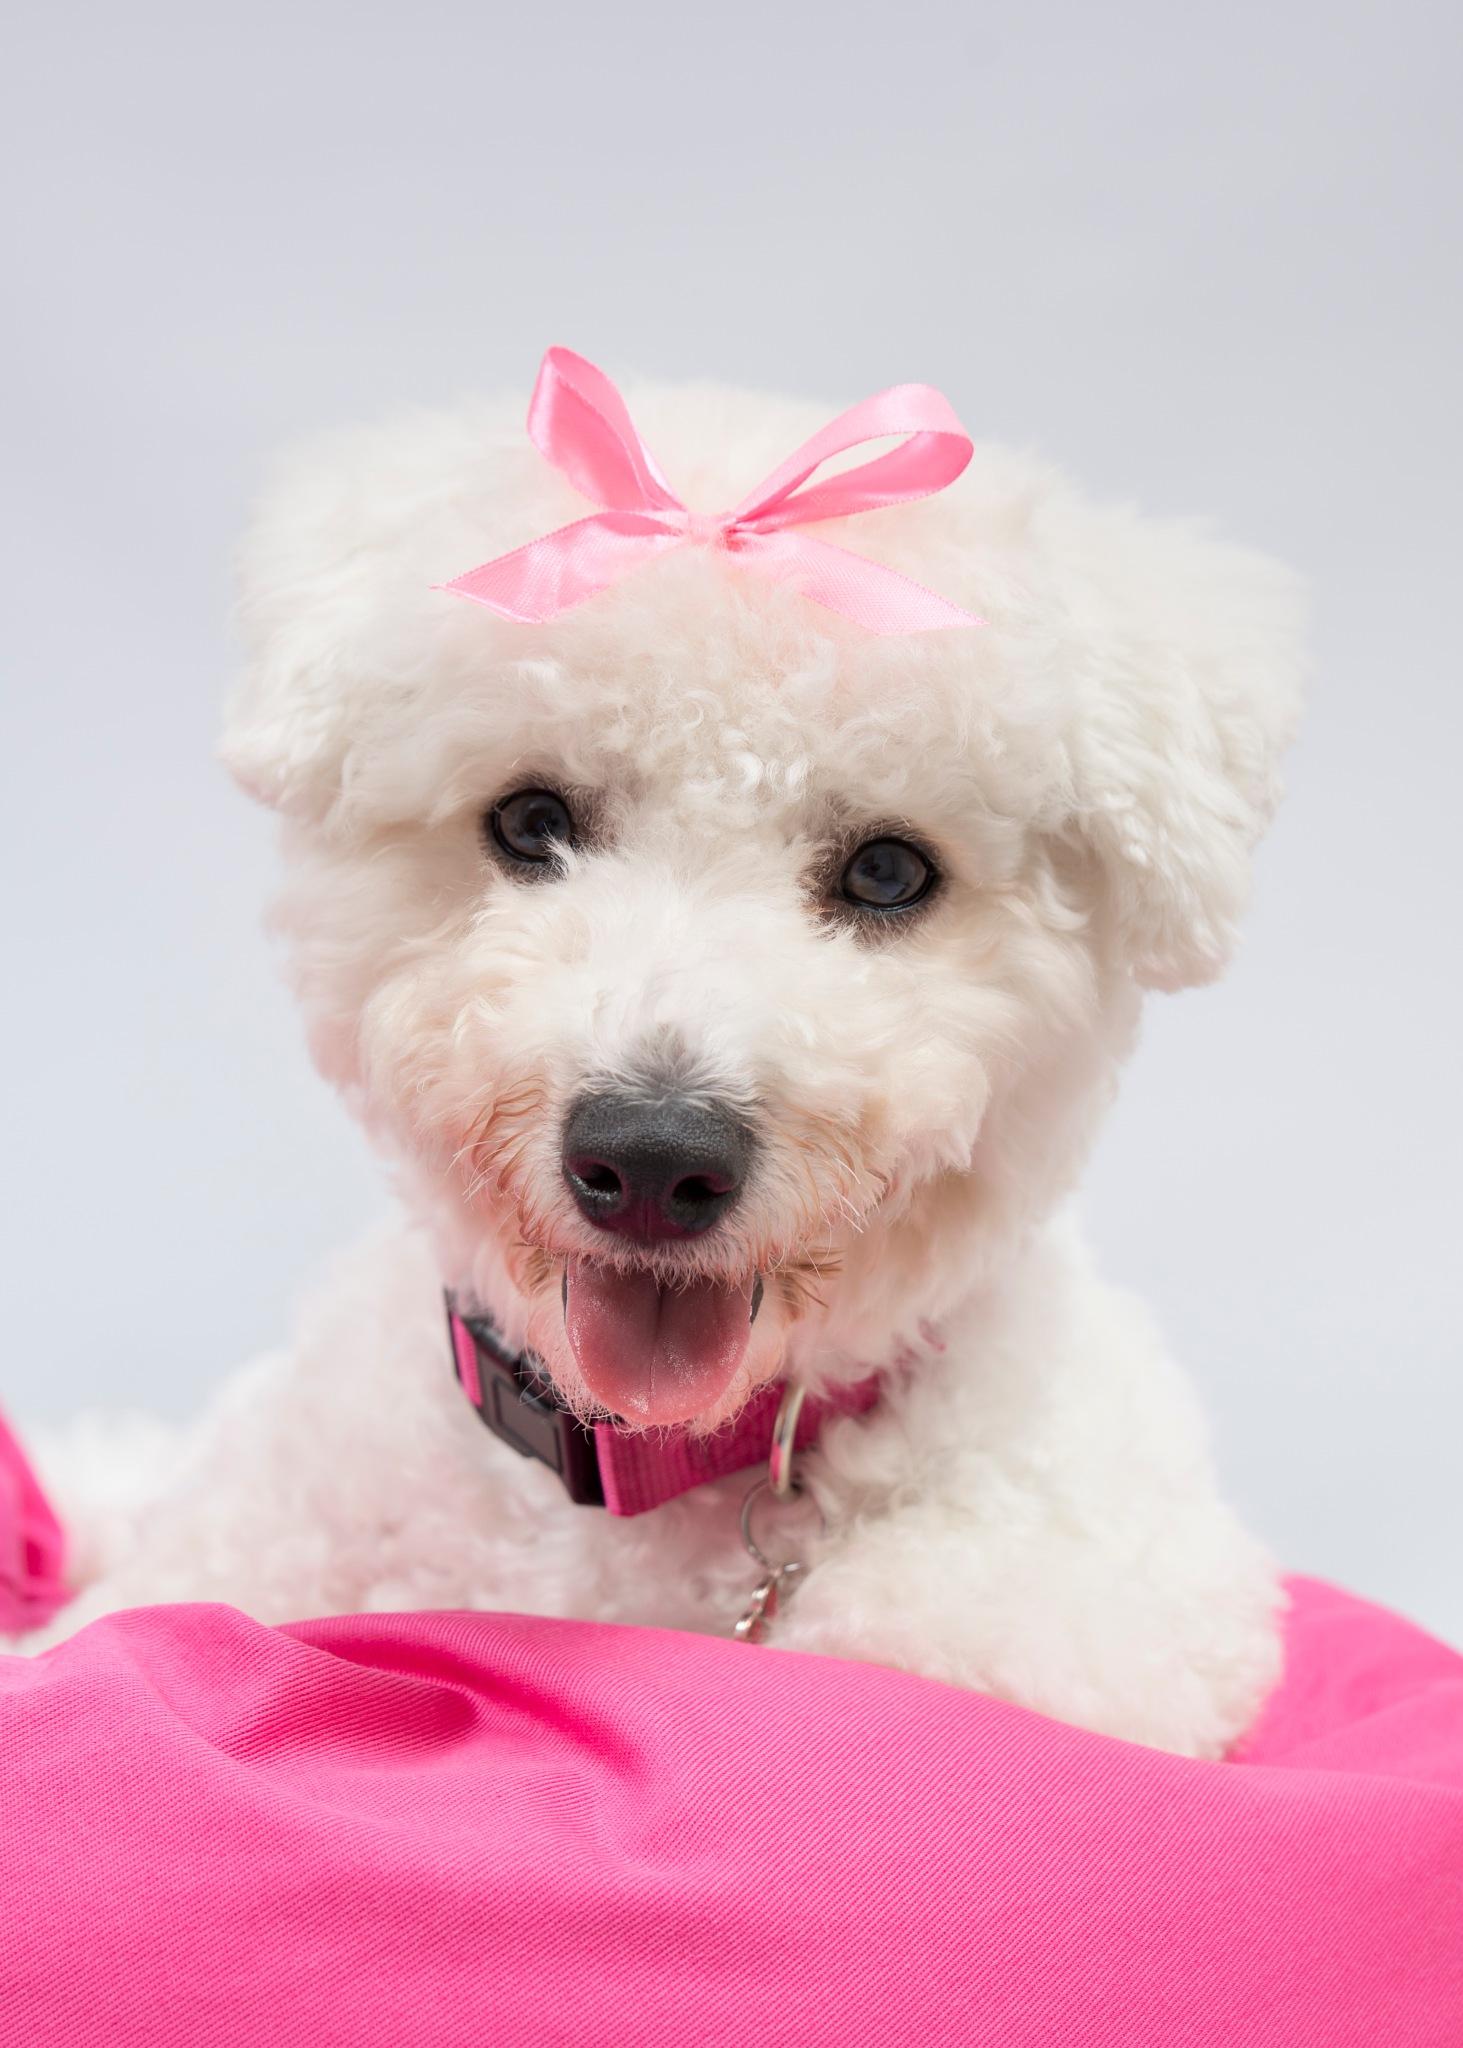 Cute Puppy Alert by paul.spencer.39395